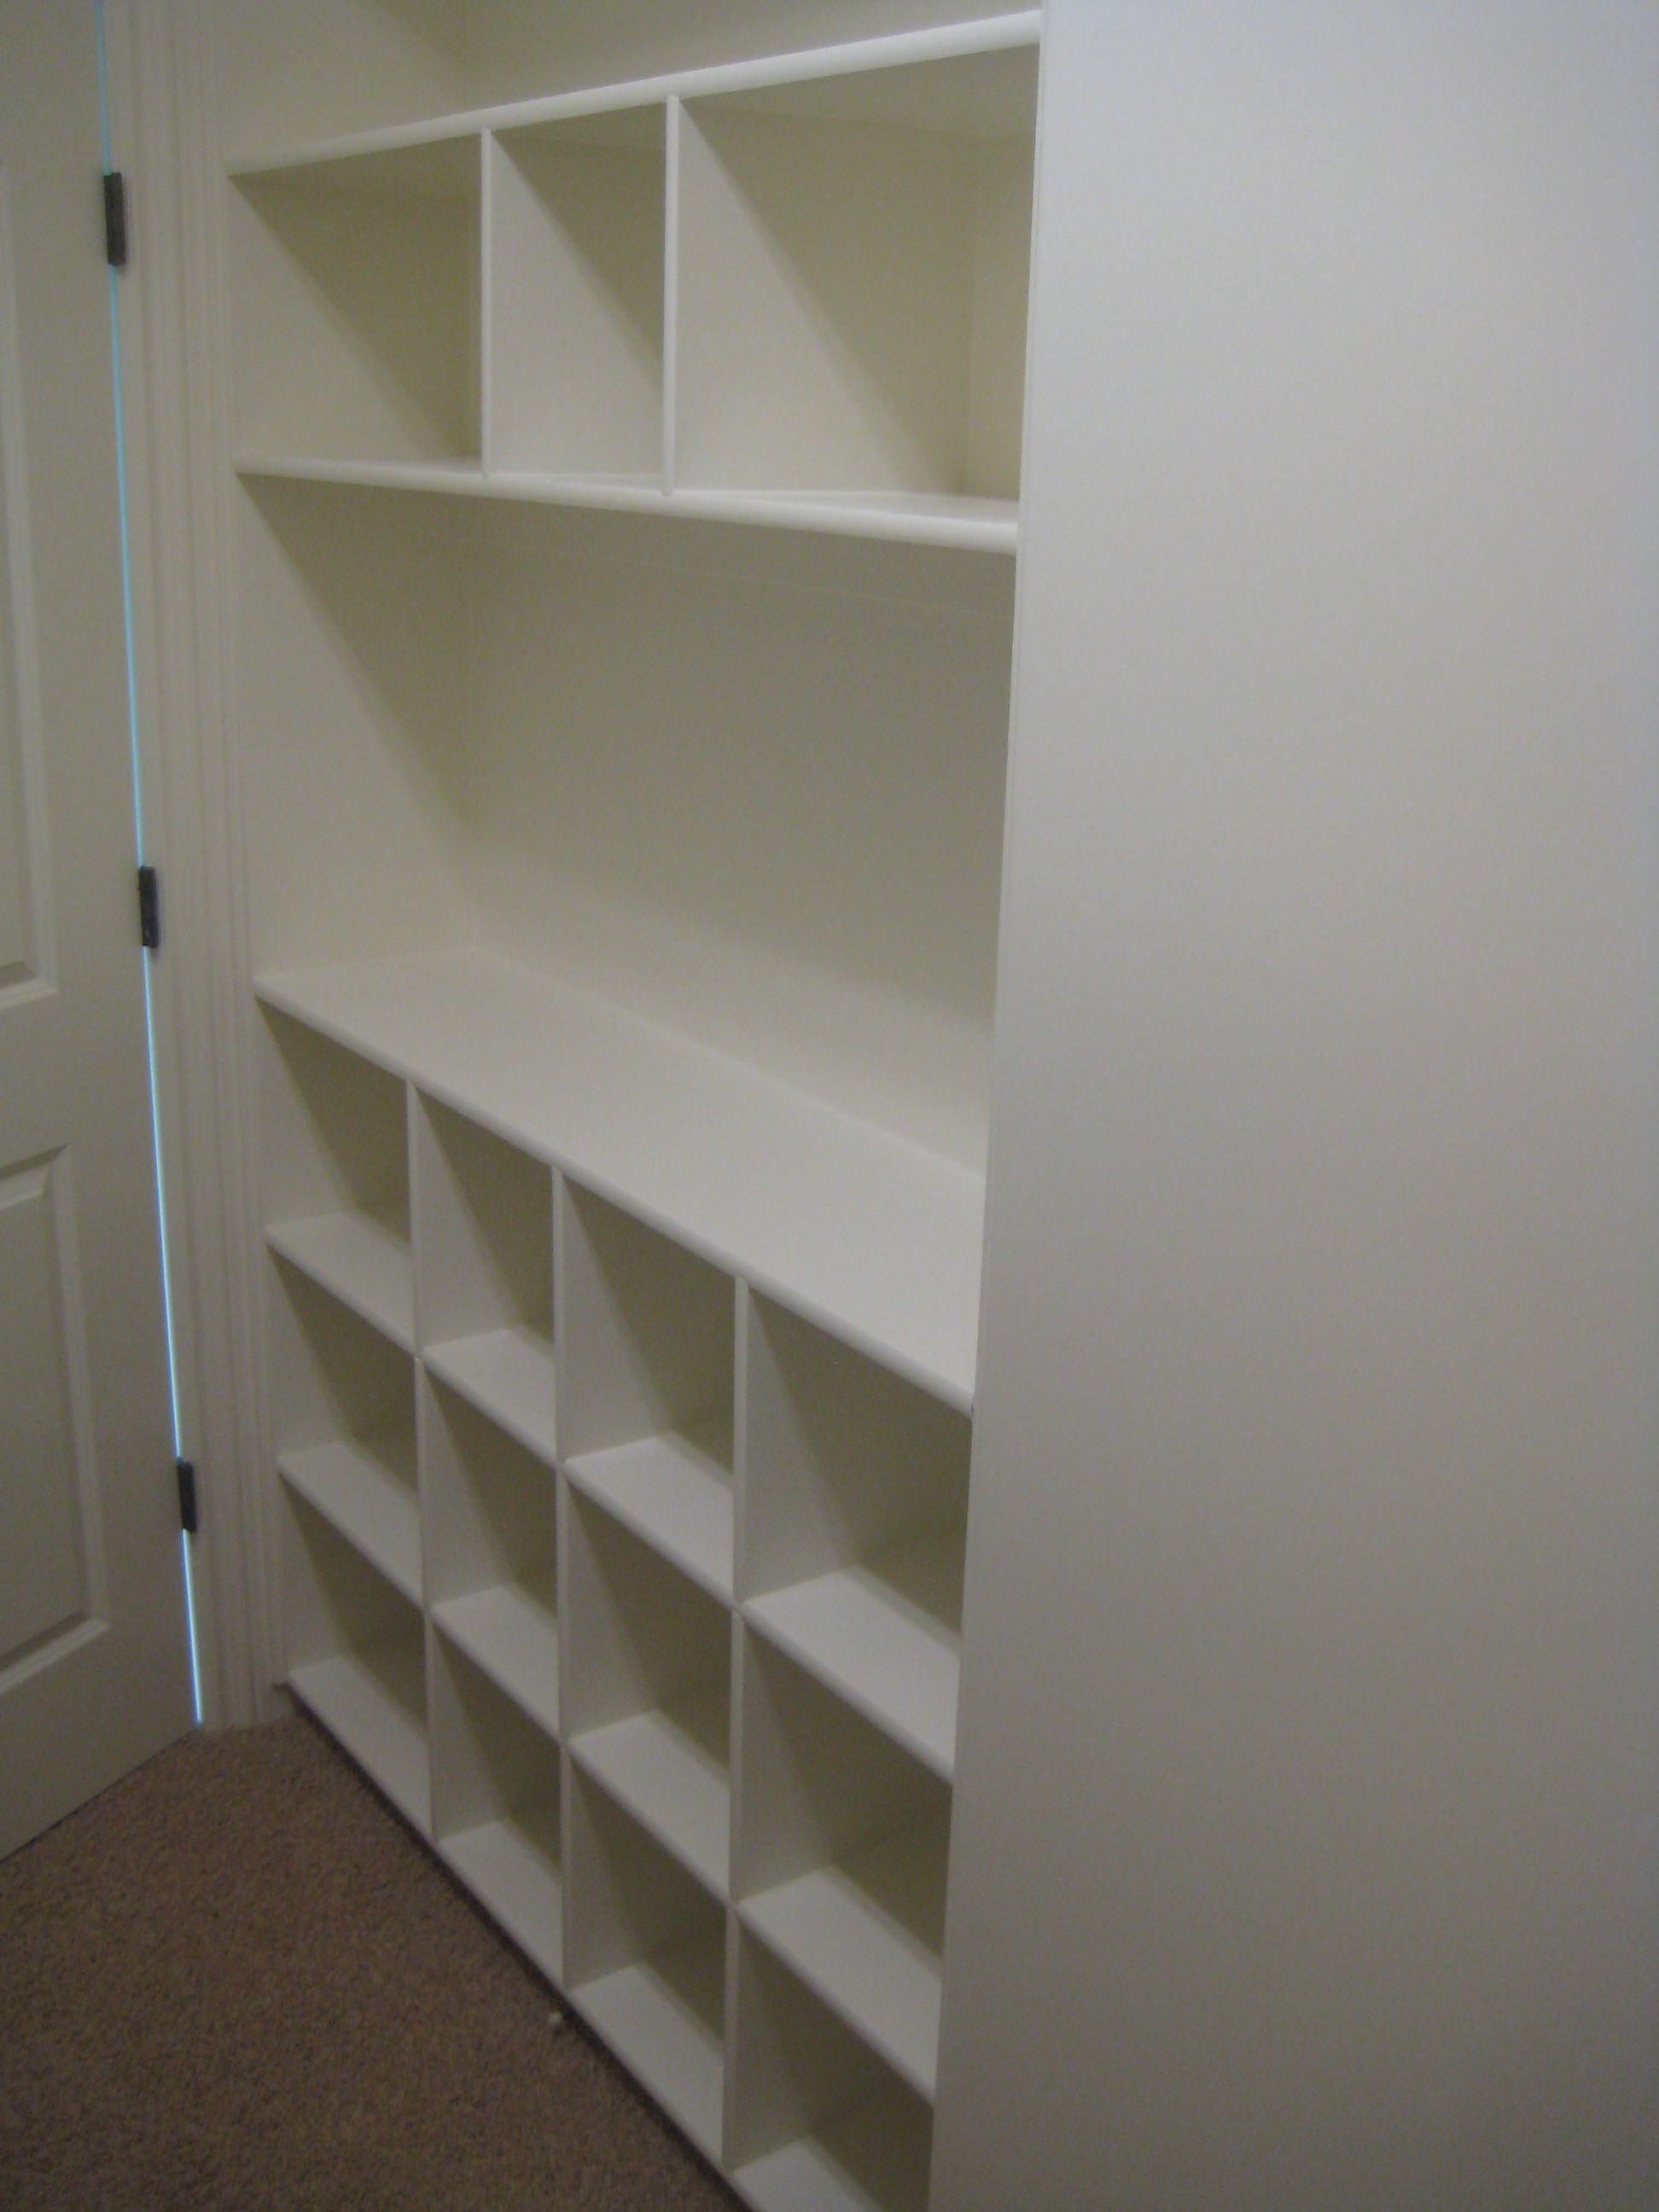 closets built in shelves organize closets bathroom. Black Bedroom Furniture Sets. Home Design Ideas